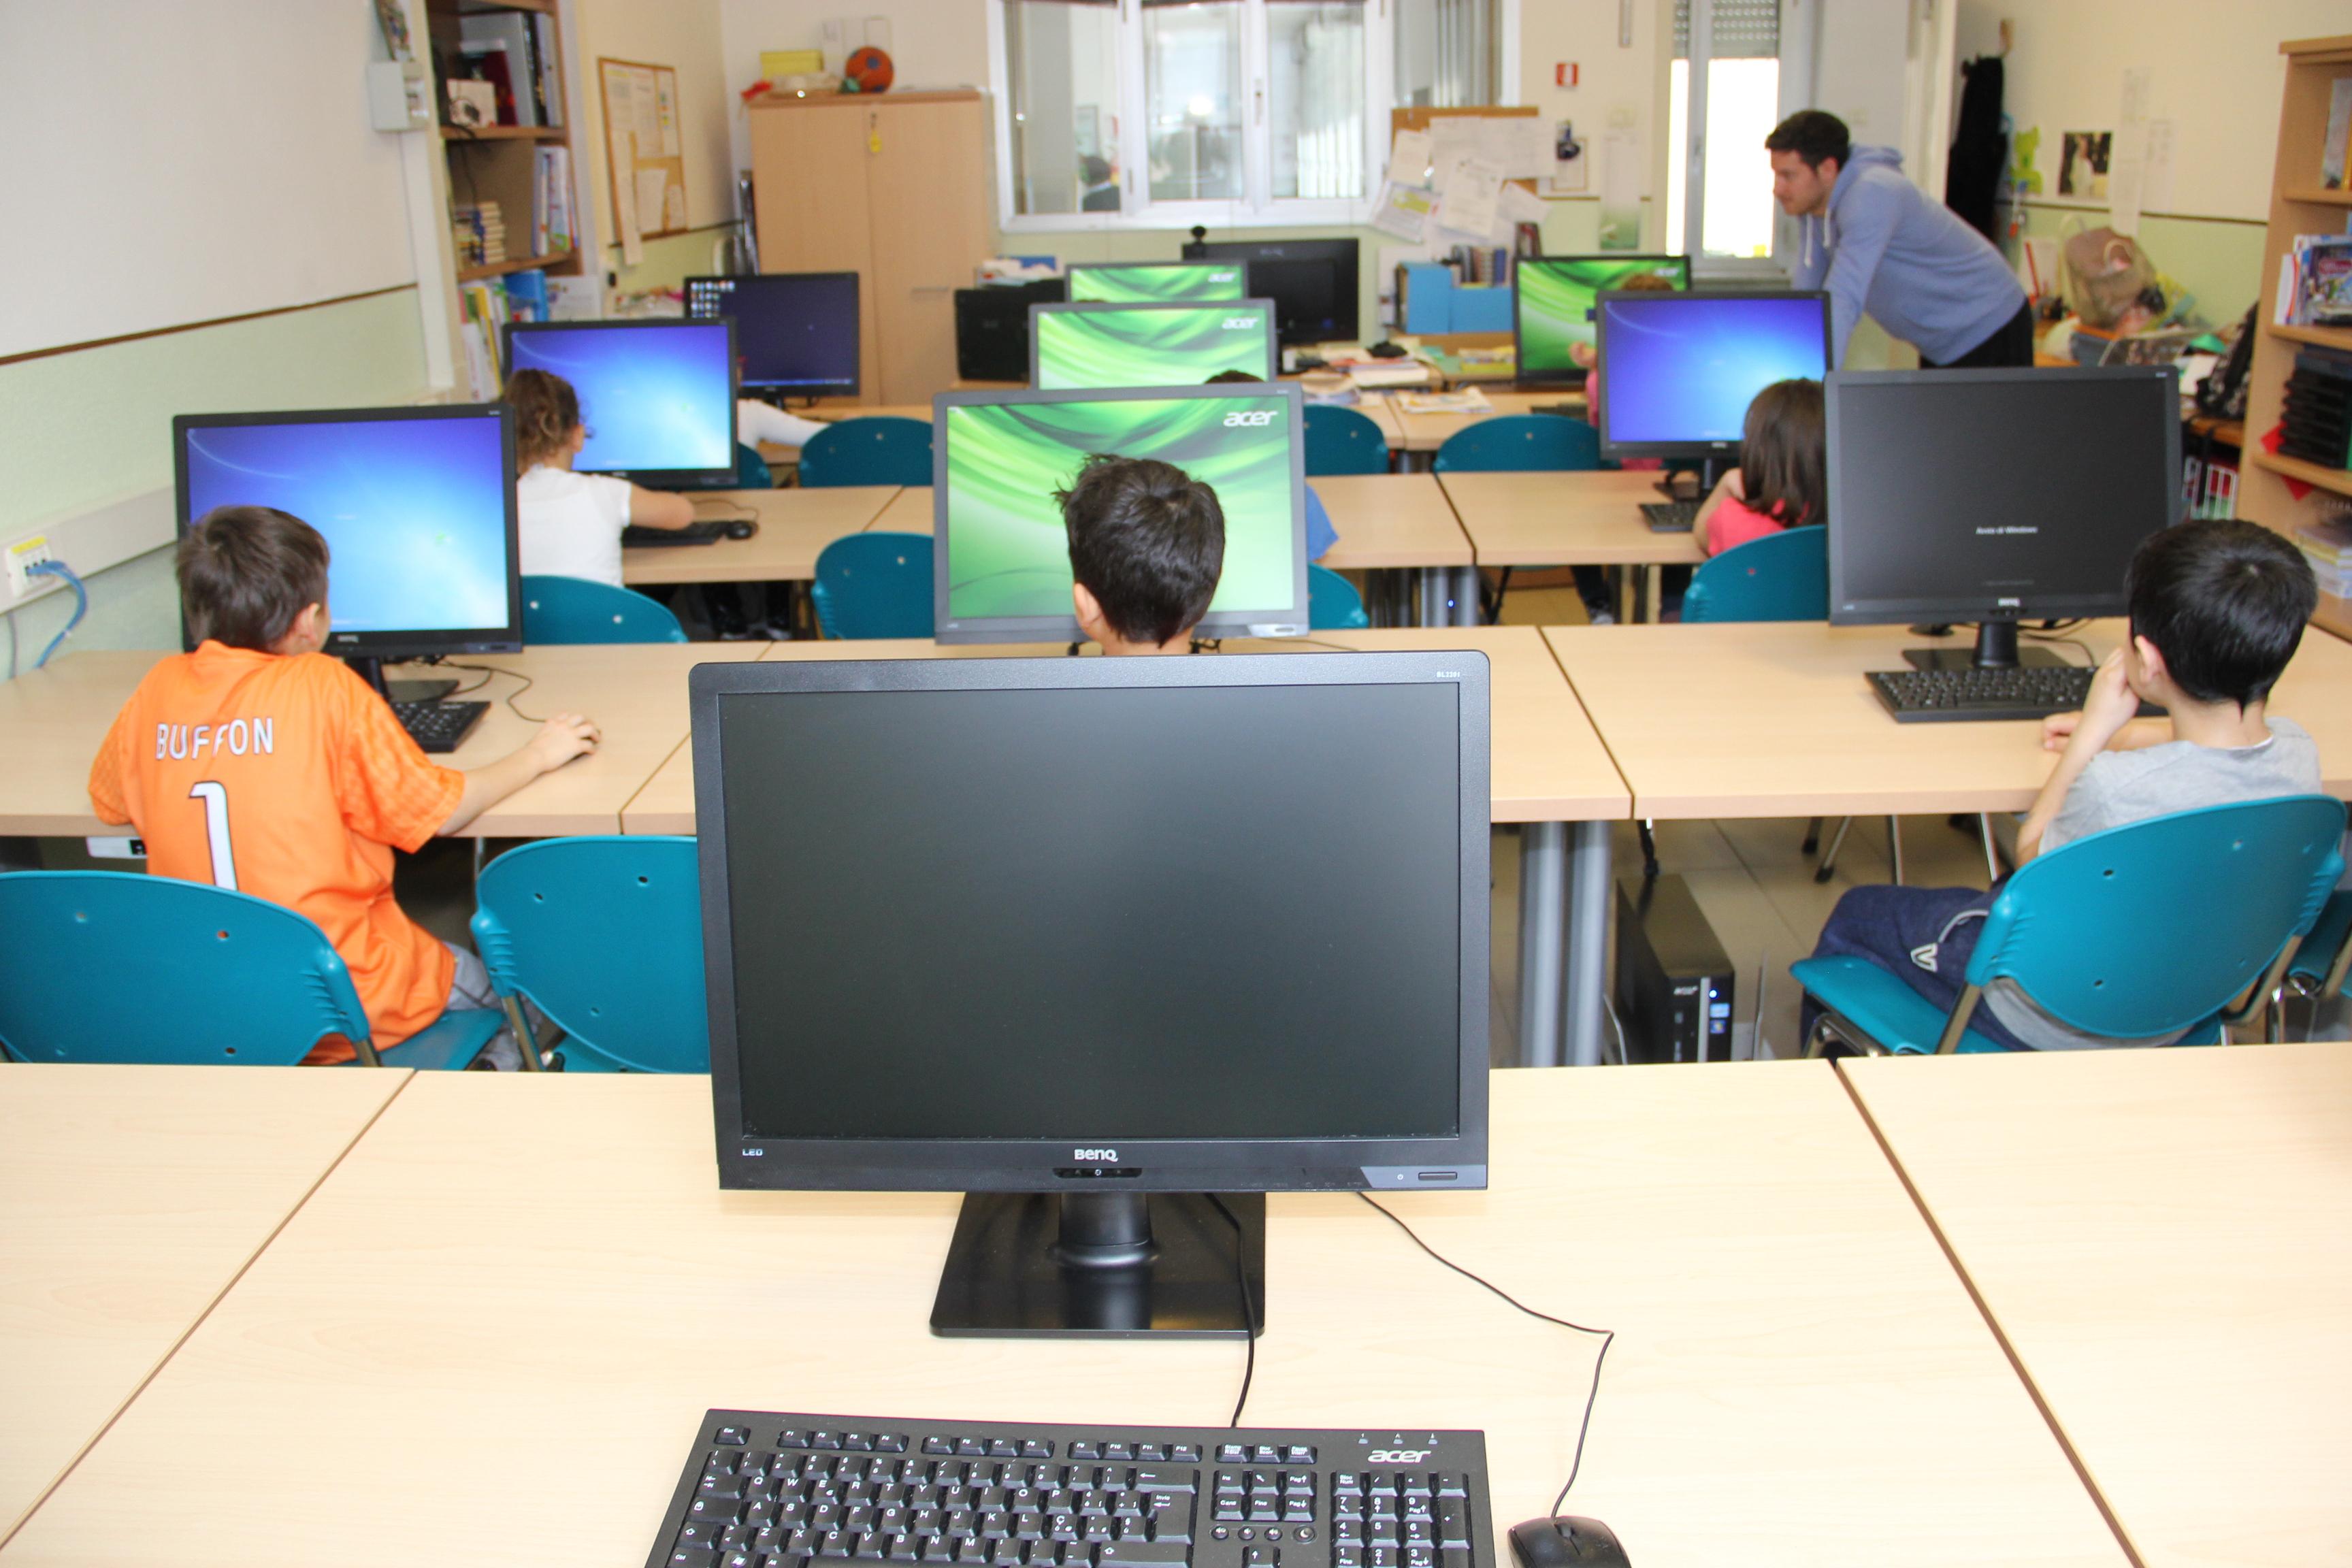 Aula multimediale Scuola Maria Ausiliatrice - Lodi